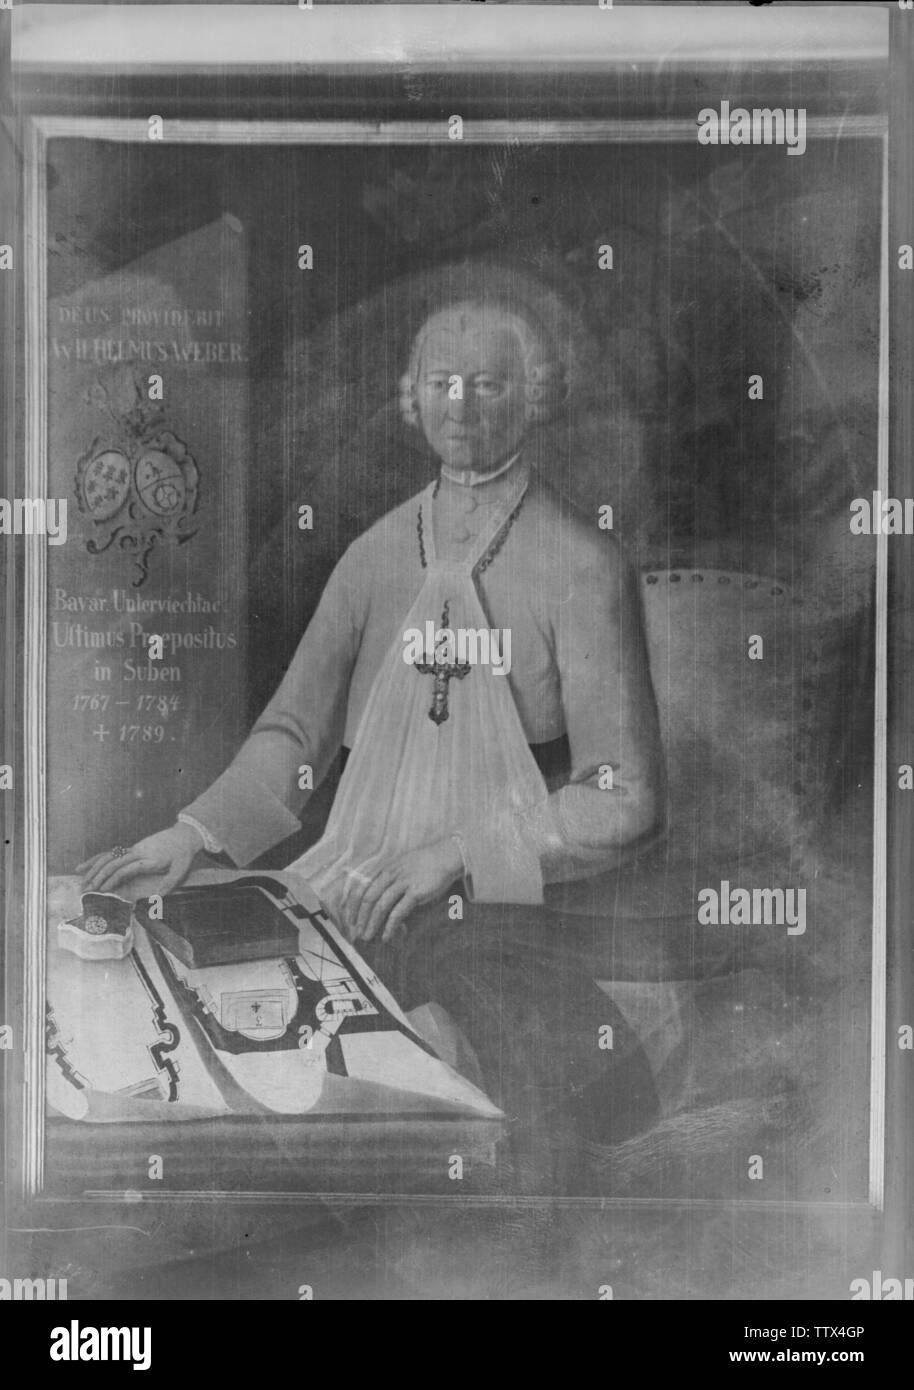 Abate Wilhelm Weber, pittura ad olio su tela in Abbazia Agostiniana in Reichersberg, Austria superiore, Additional-Rights-Clearance-Info-Not-Available Immagini Stock